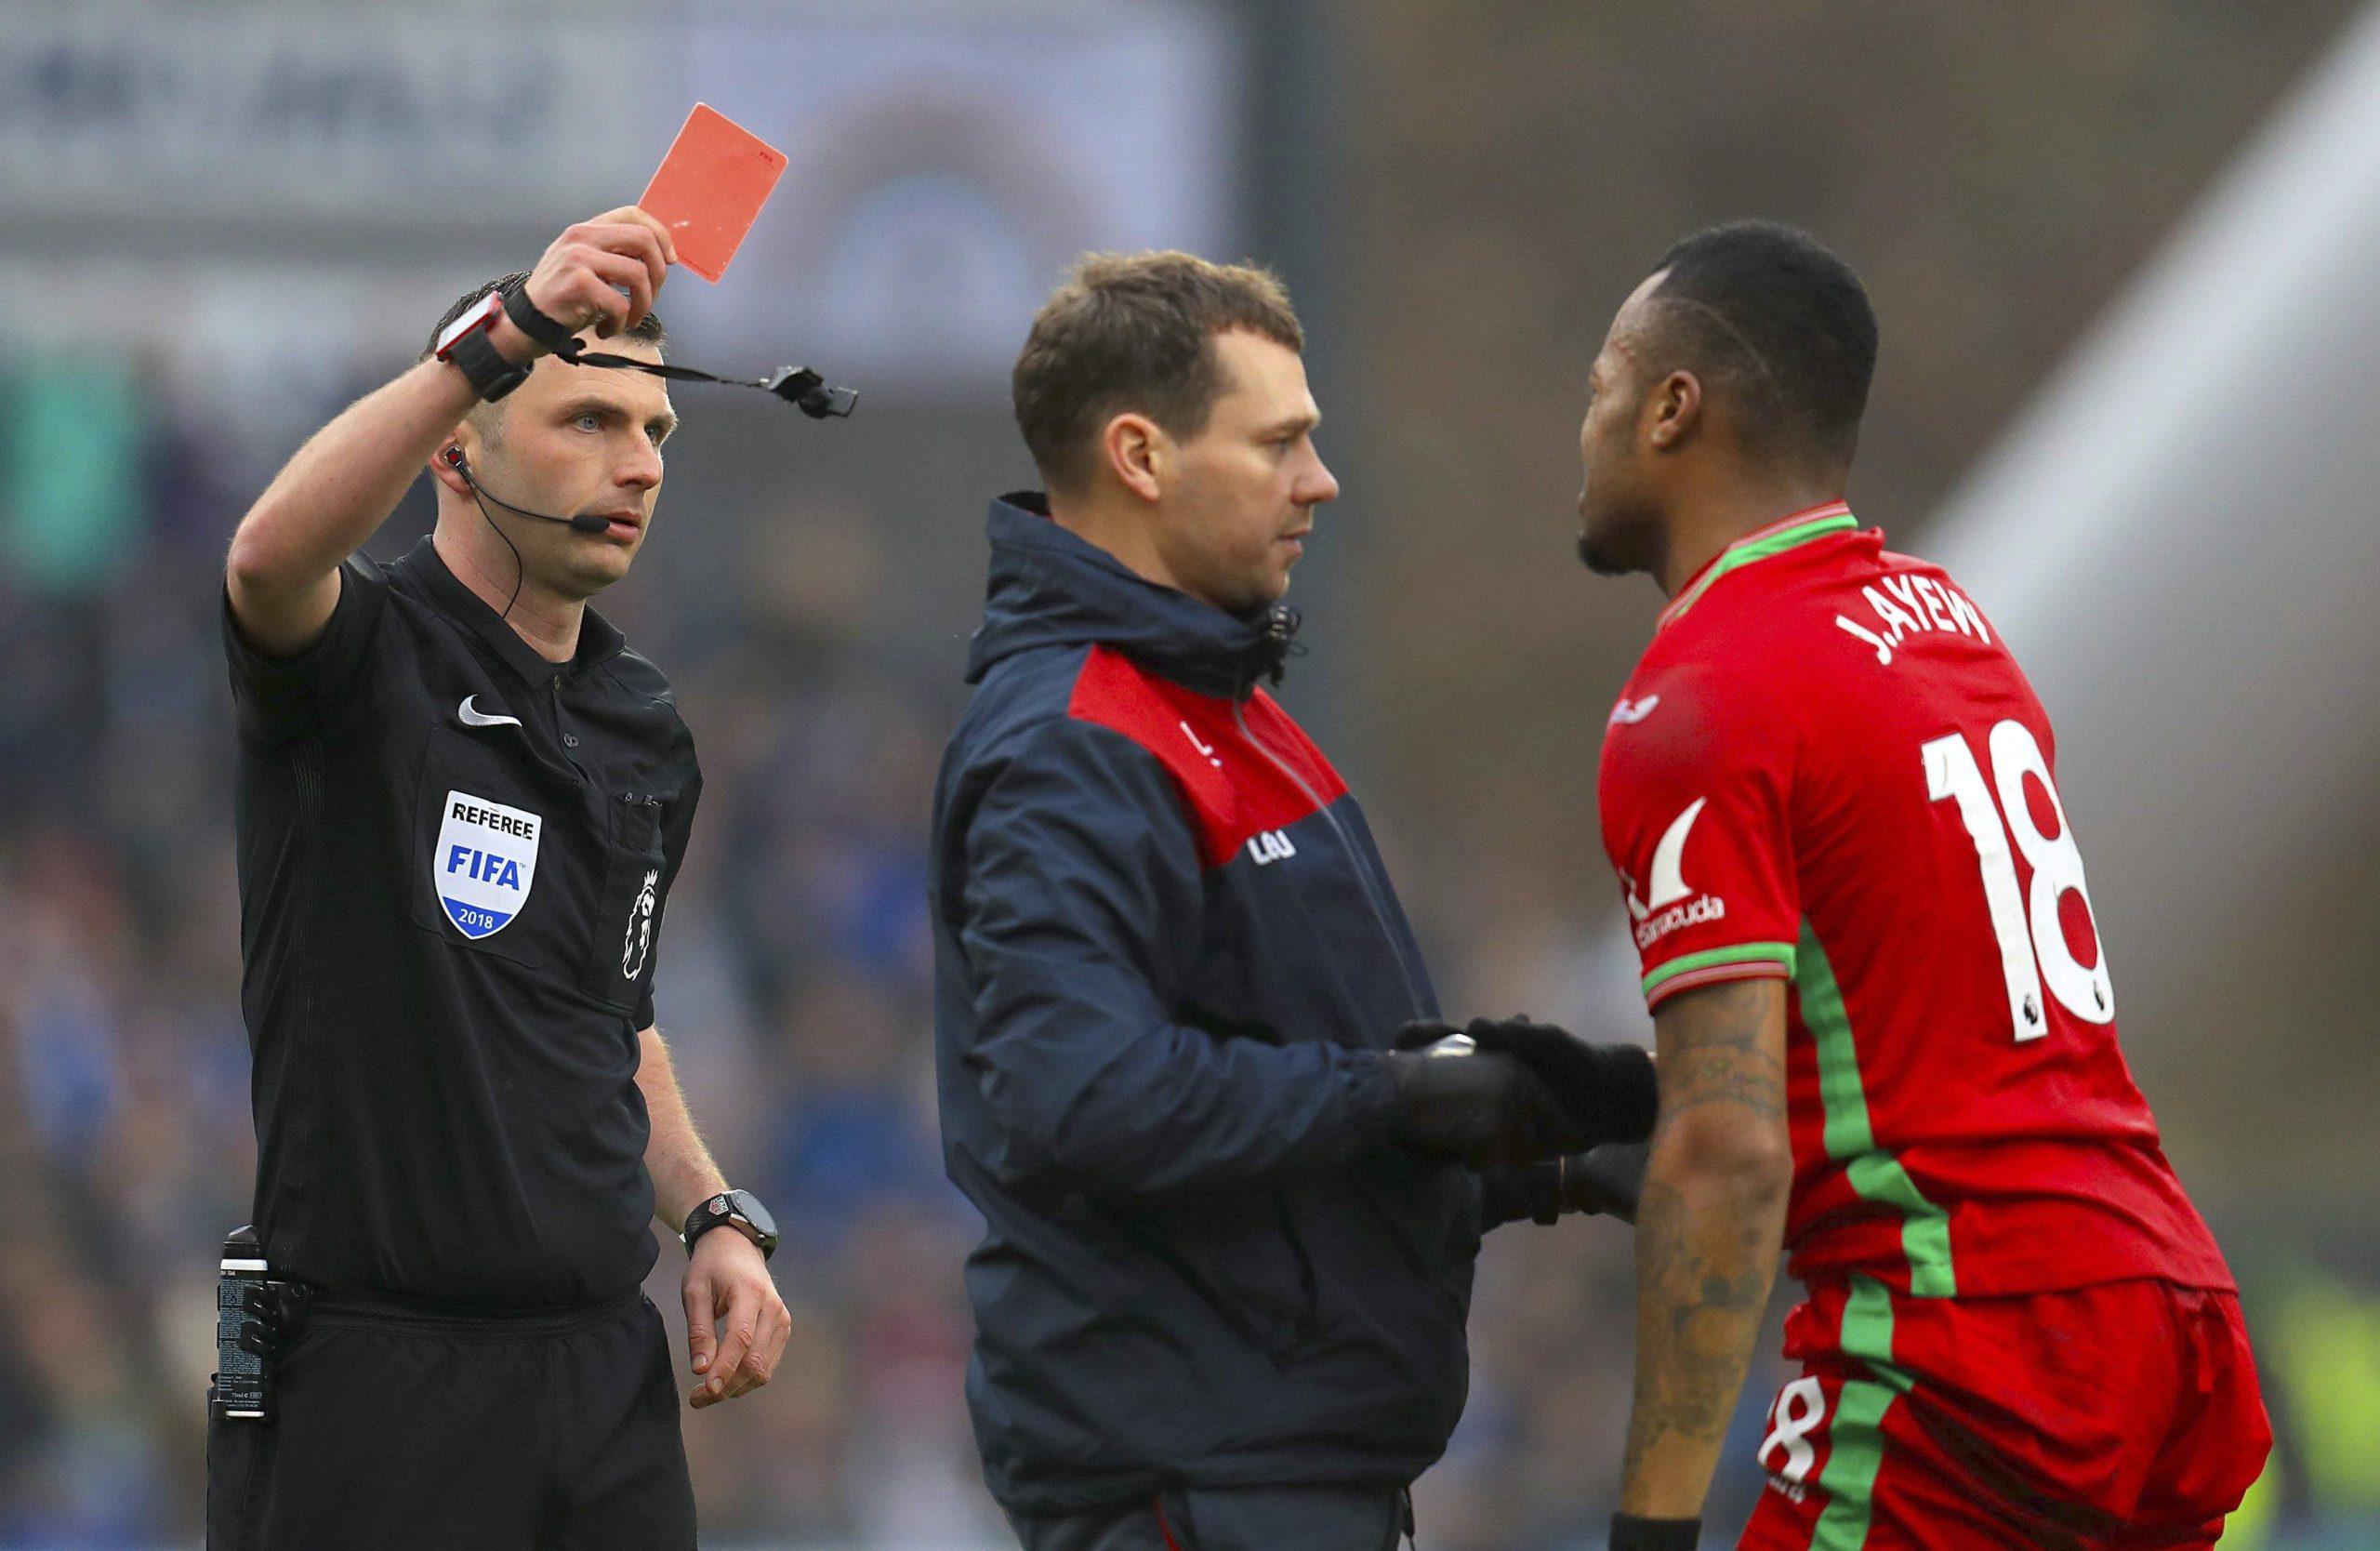 Swansea City defender Martin Olsson hails Ayew's return from suspension